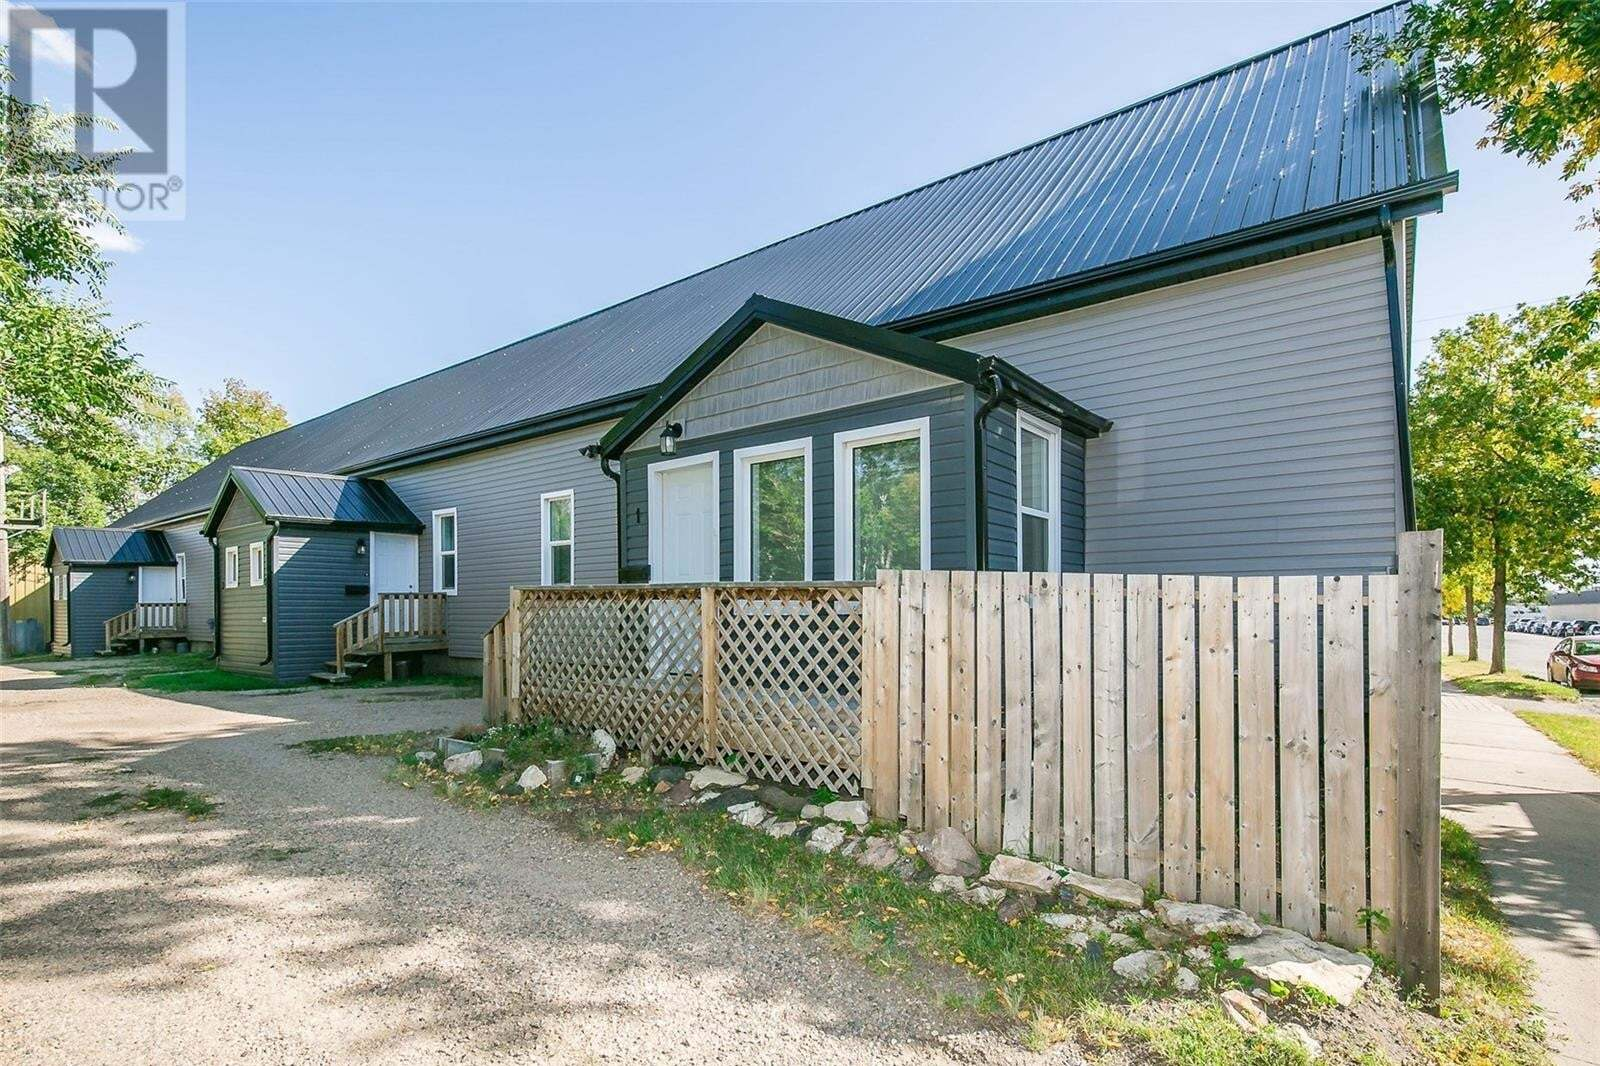 Townhouse for sale at 312 C Ave N Saskatoon Saskatchewan - MLS: SK826656